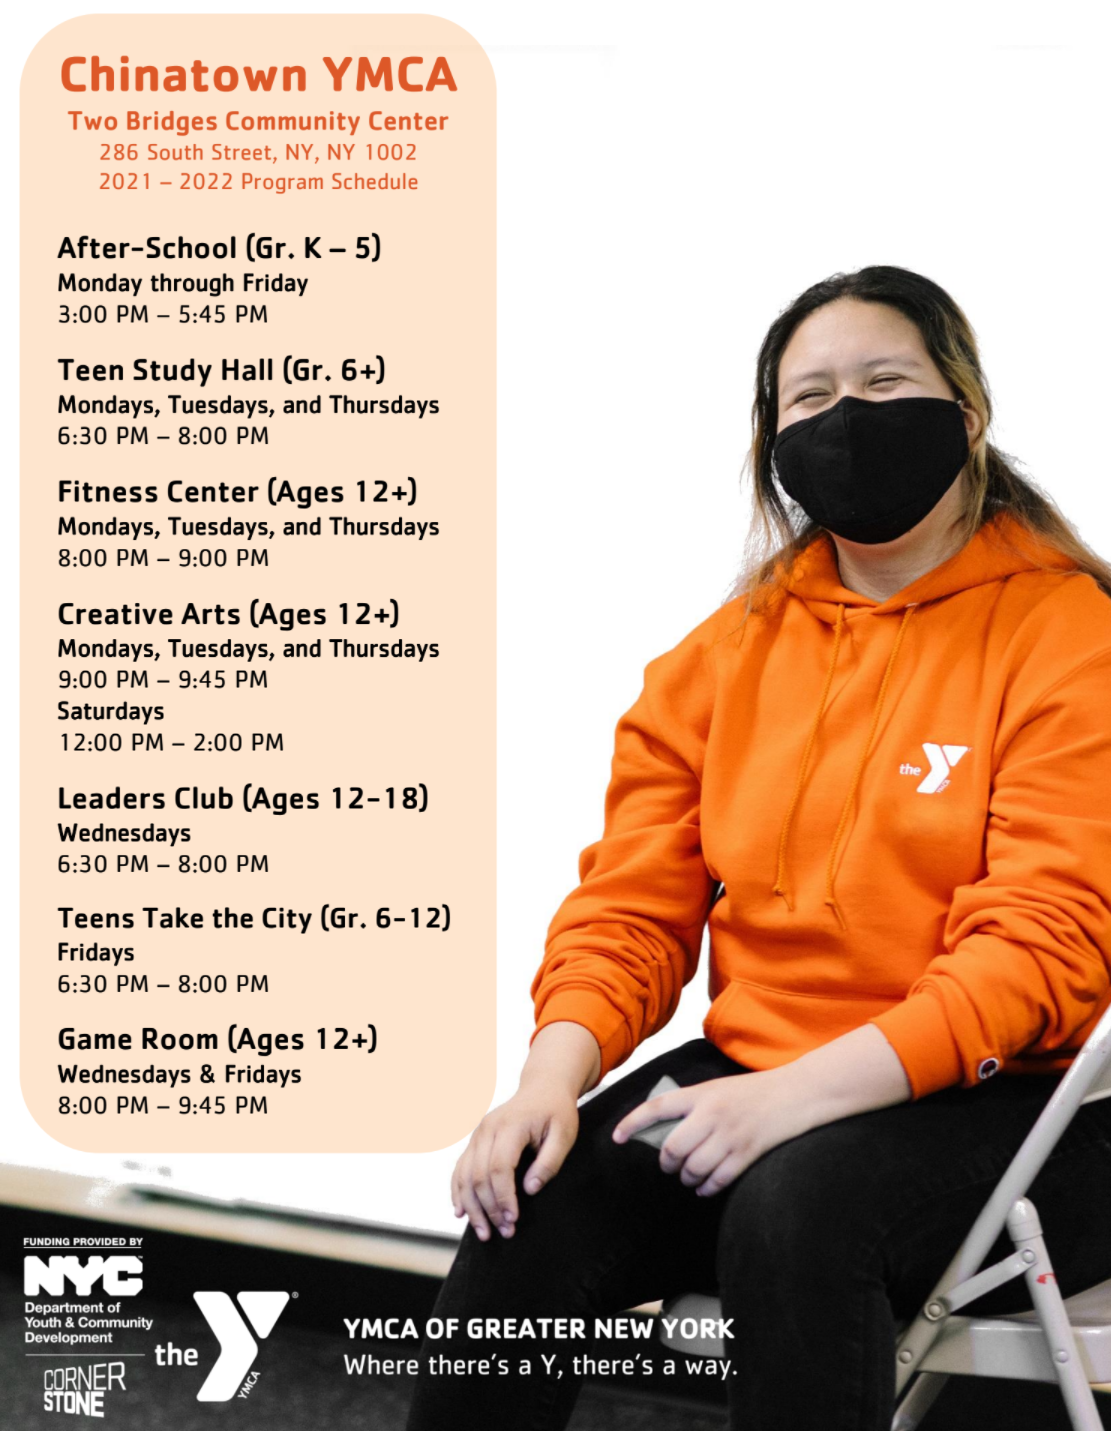 Chinatown YMCA: Teens Take the City